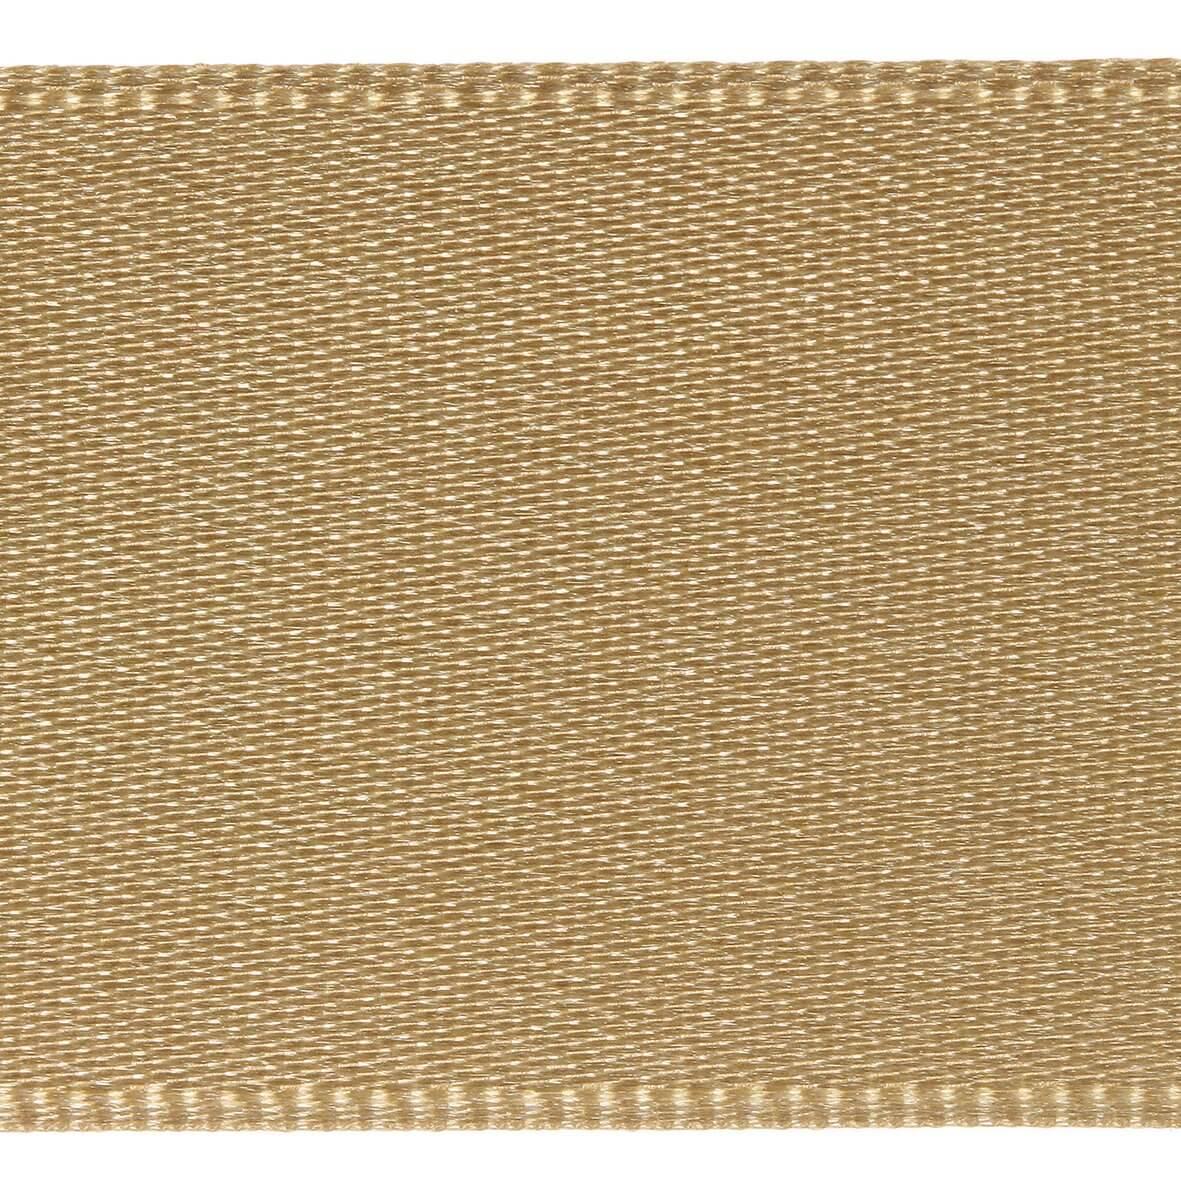 15mm Berisfords Satin Ribbon - Straw Colour 6835